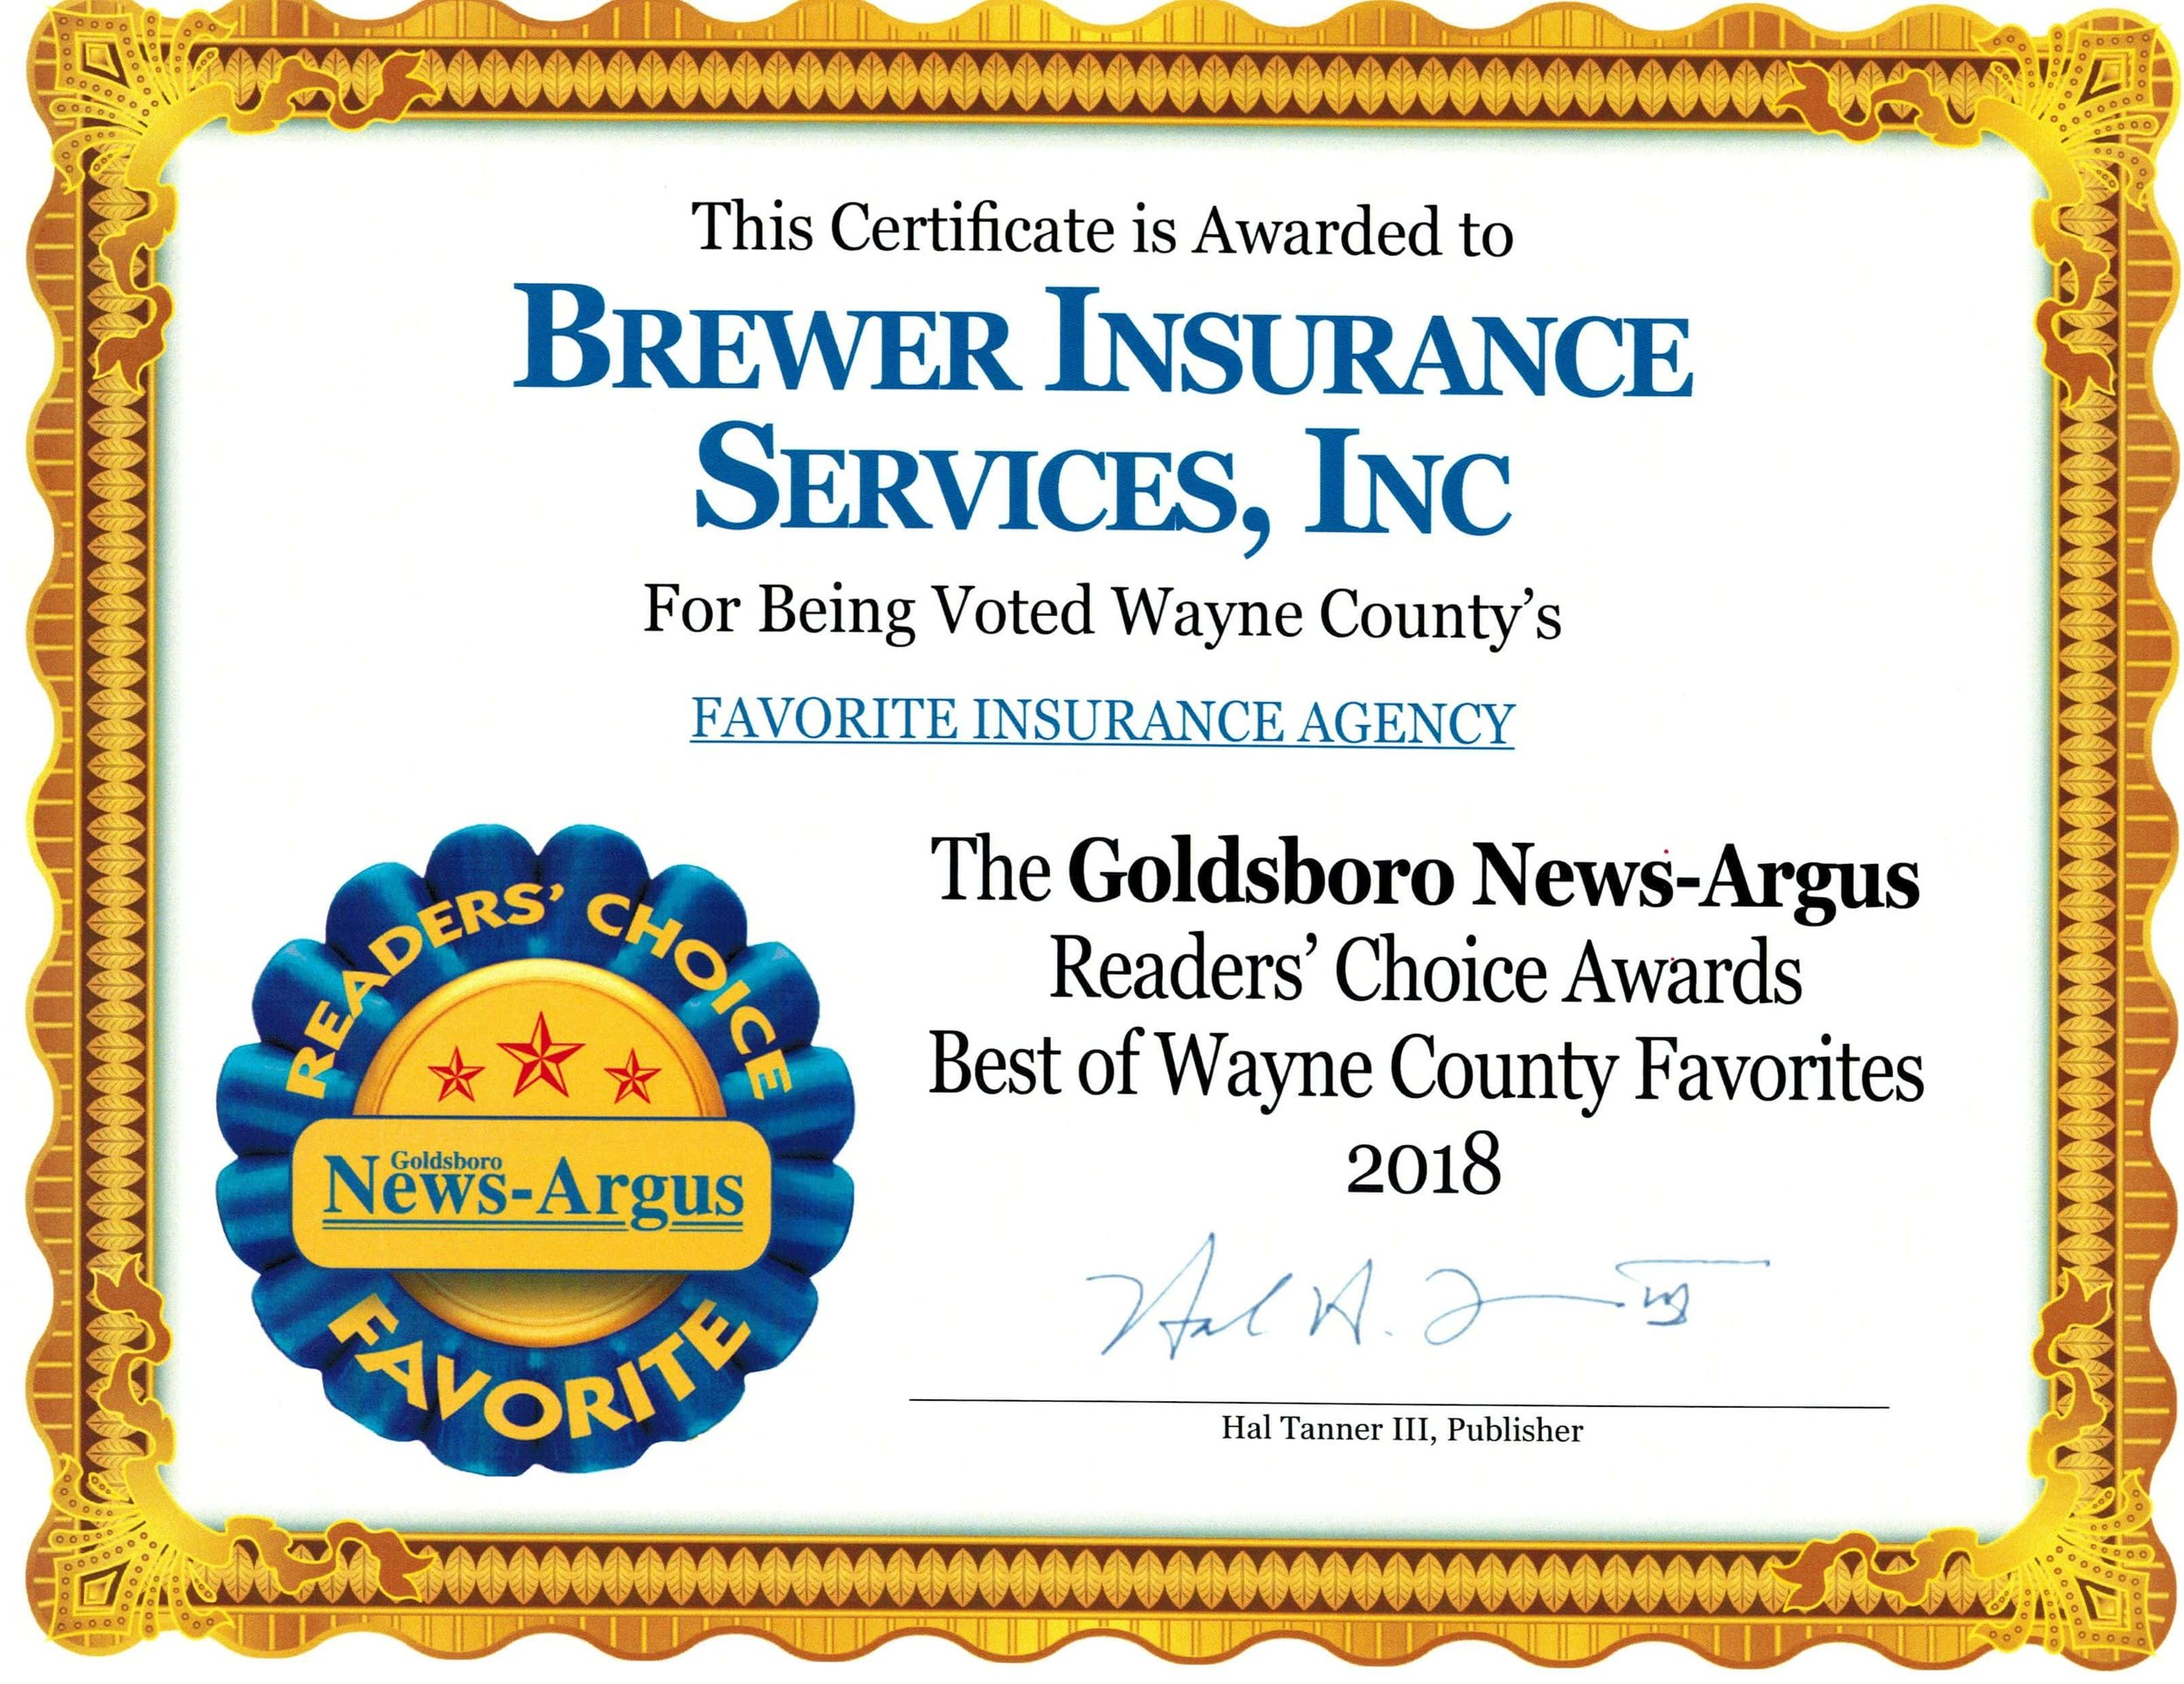 Brewer Insurance Services Favorite Insurance Agency-min.jpg